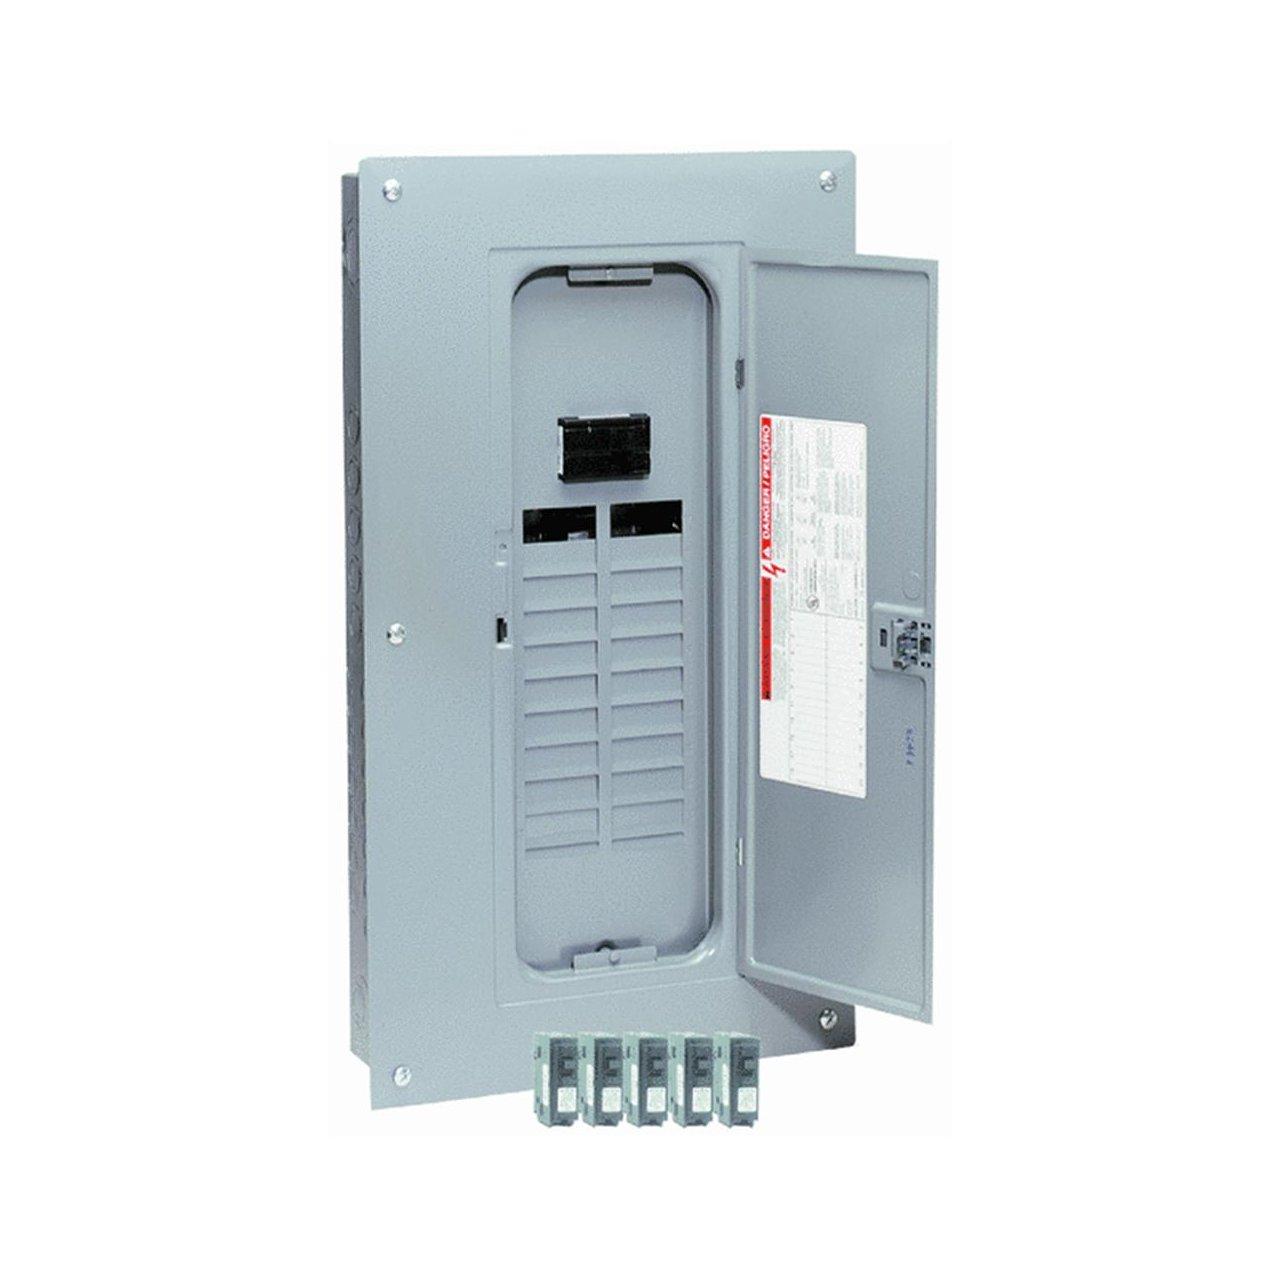 Square D Co. HOMVP5 Homeline Load Center Remodeler Pack - Hydraulic ...